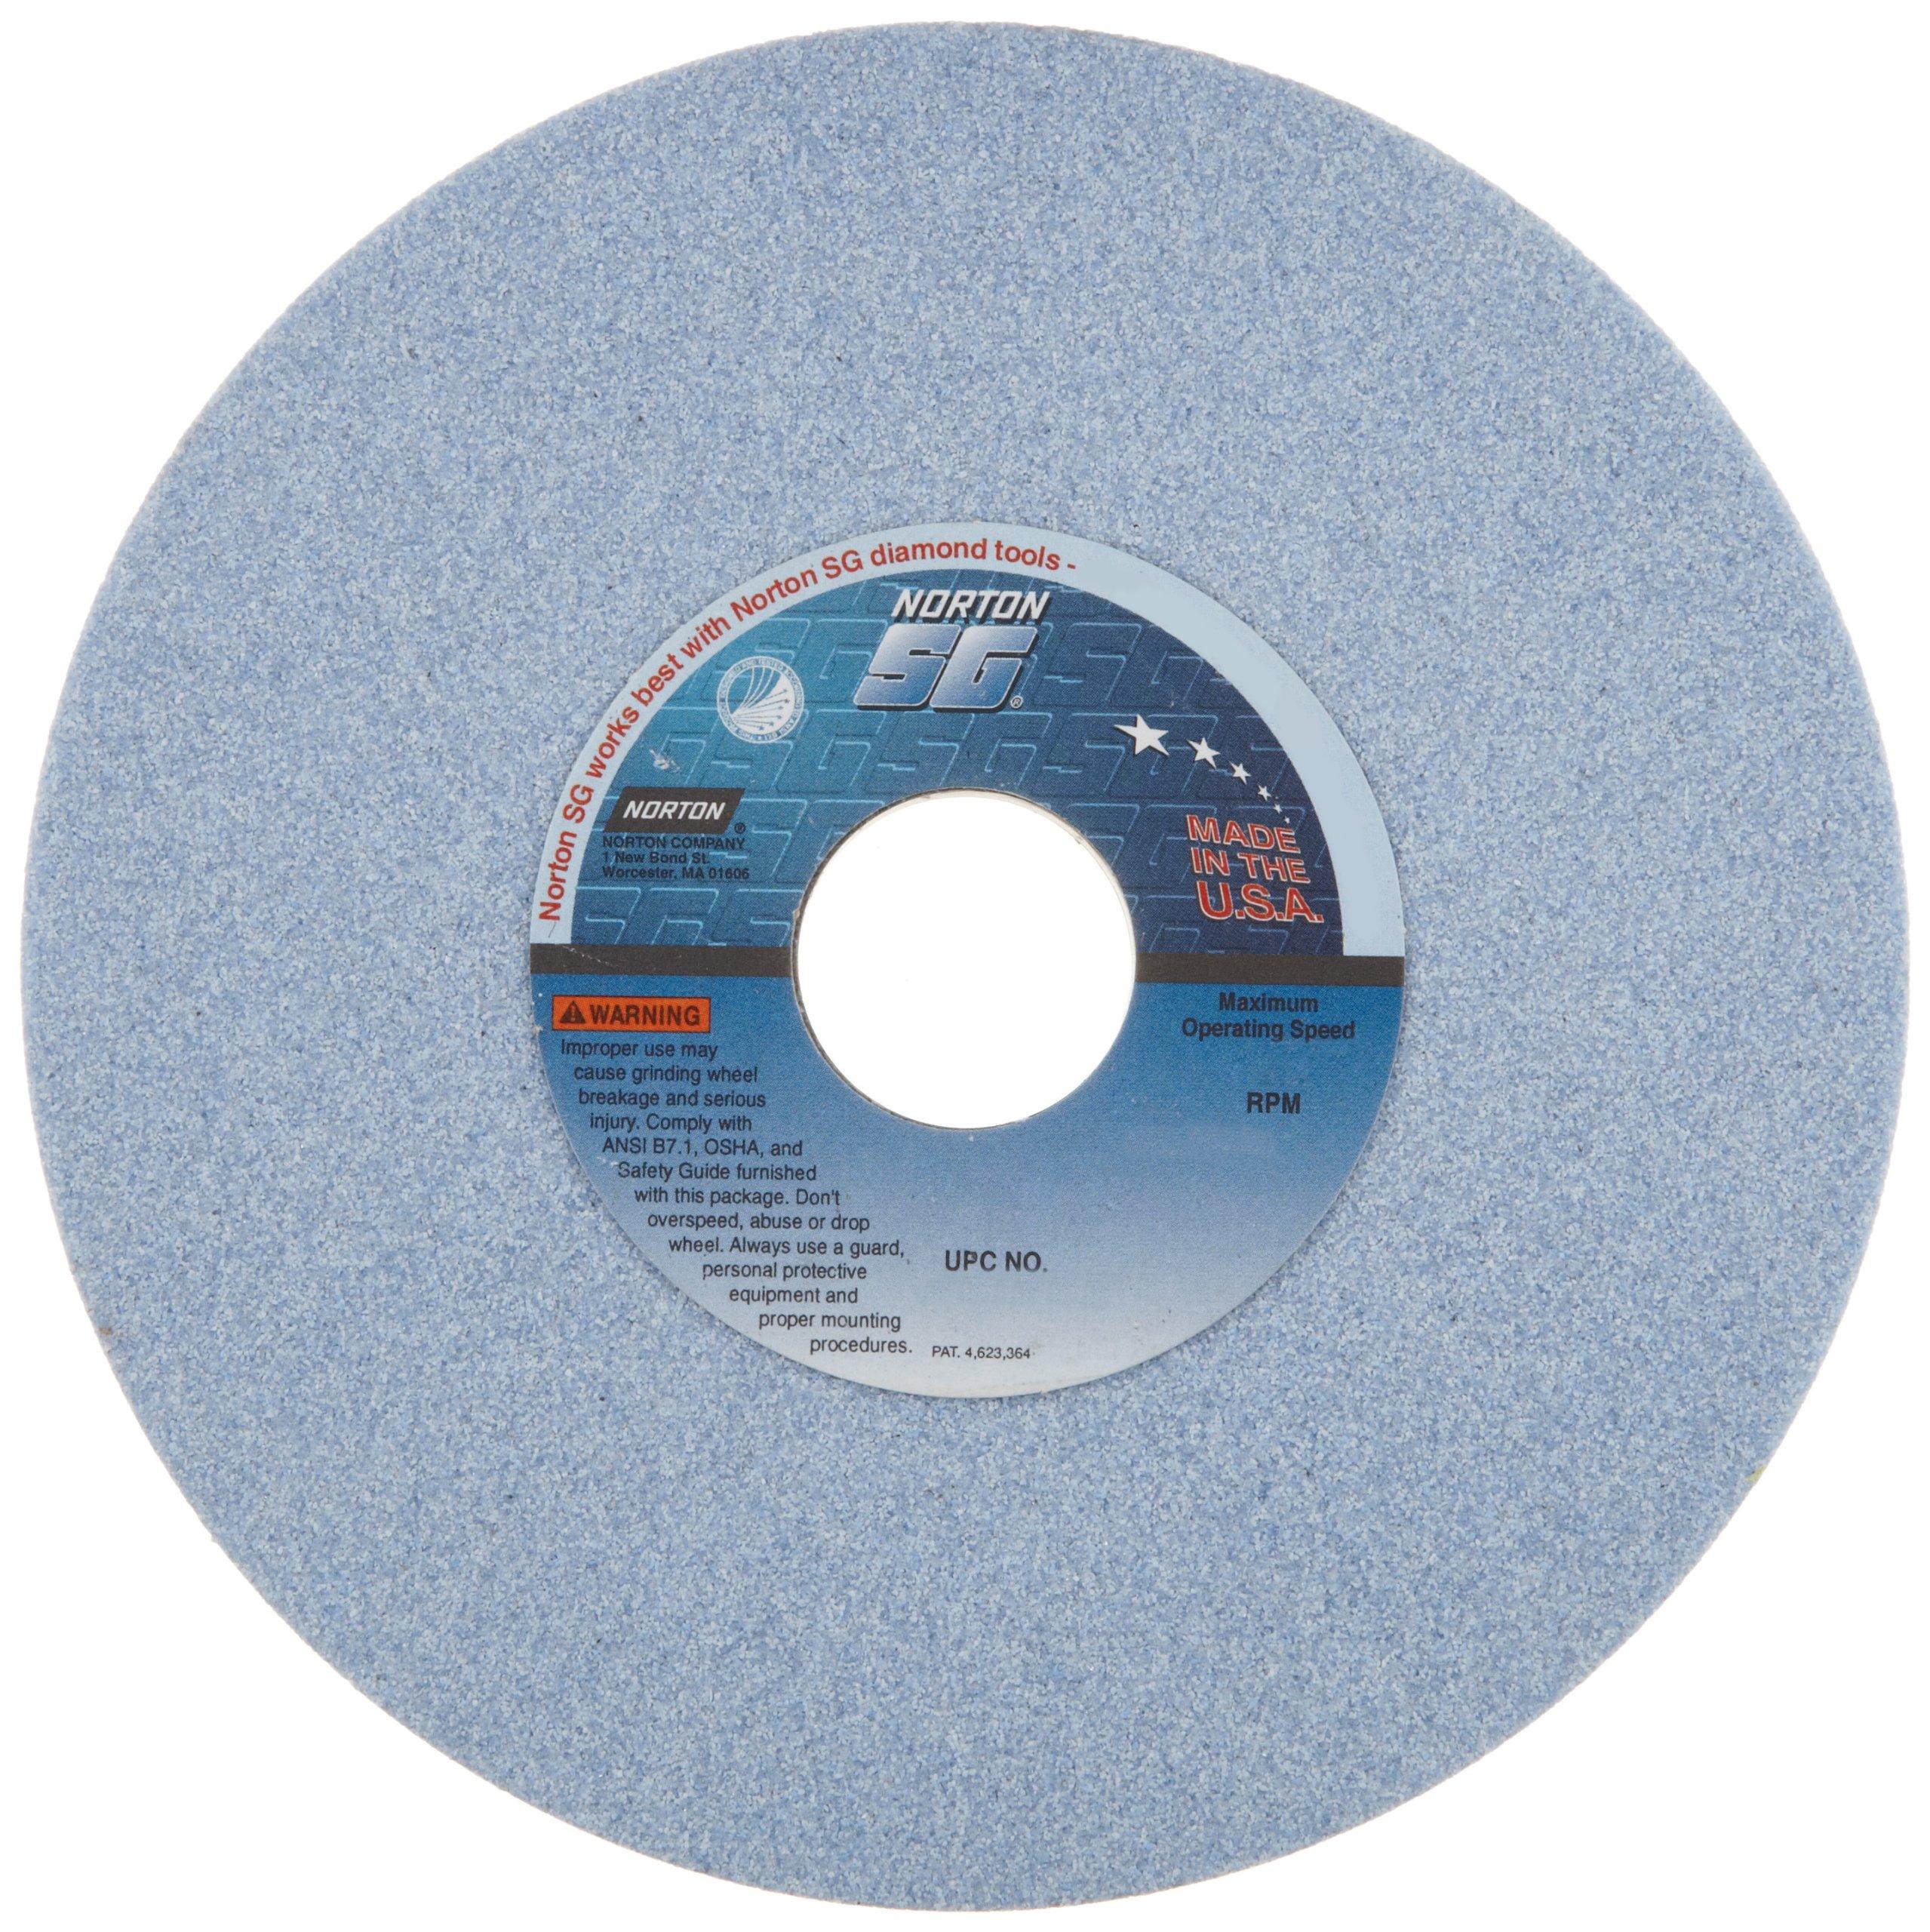 Norton 5SG Vitrified Toolroom Abrasive Wheel, Type 1 Straight, Ceramic Aluminum Oxide, 1-1/4'' Arbor, 7'' Diameter, 1/2'' Thickness, 46-I Grit (Pack of 1) by Norton Abrasives - St. Gobain